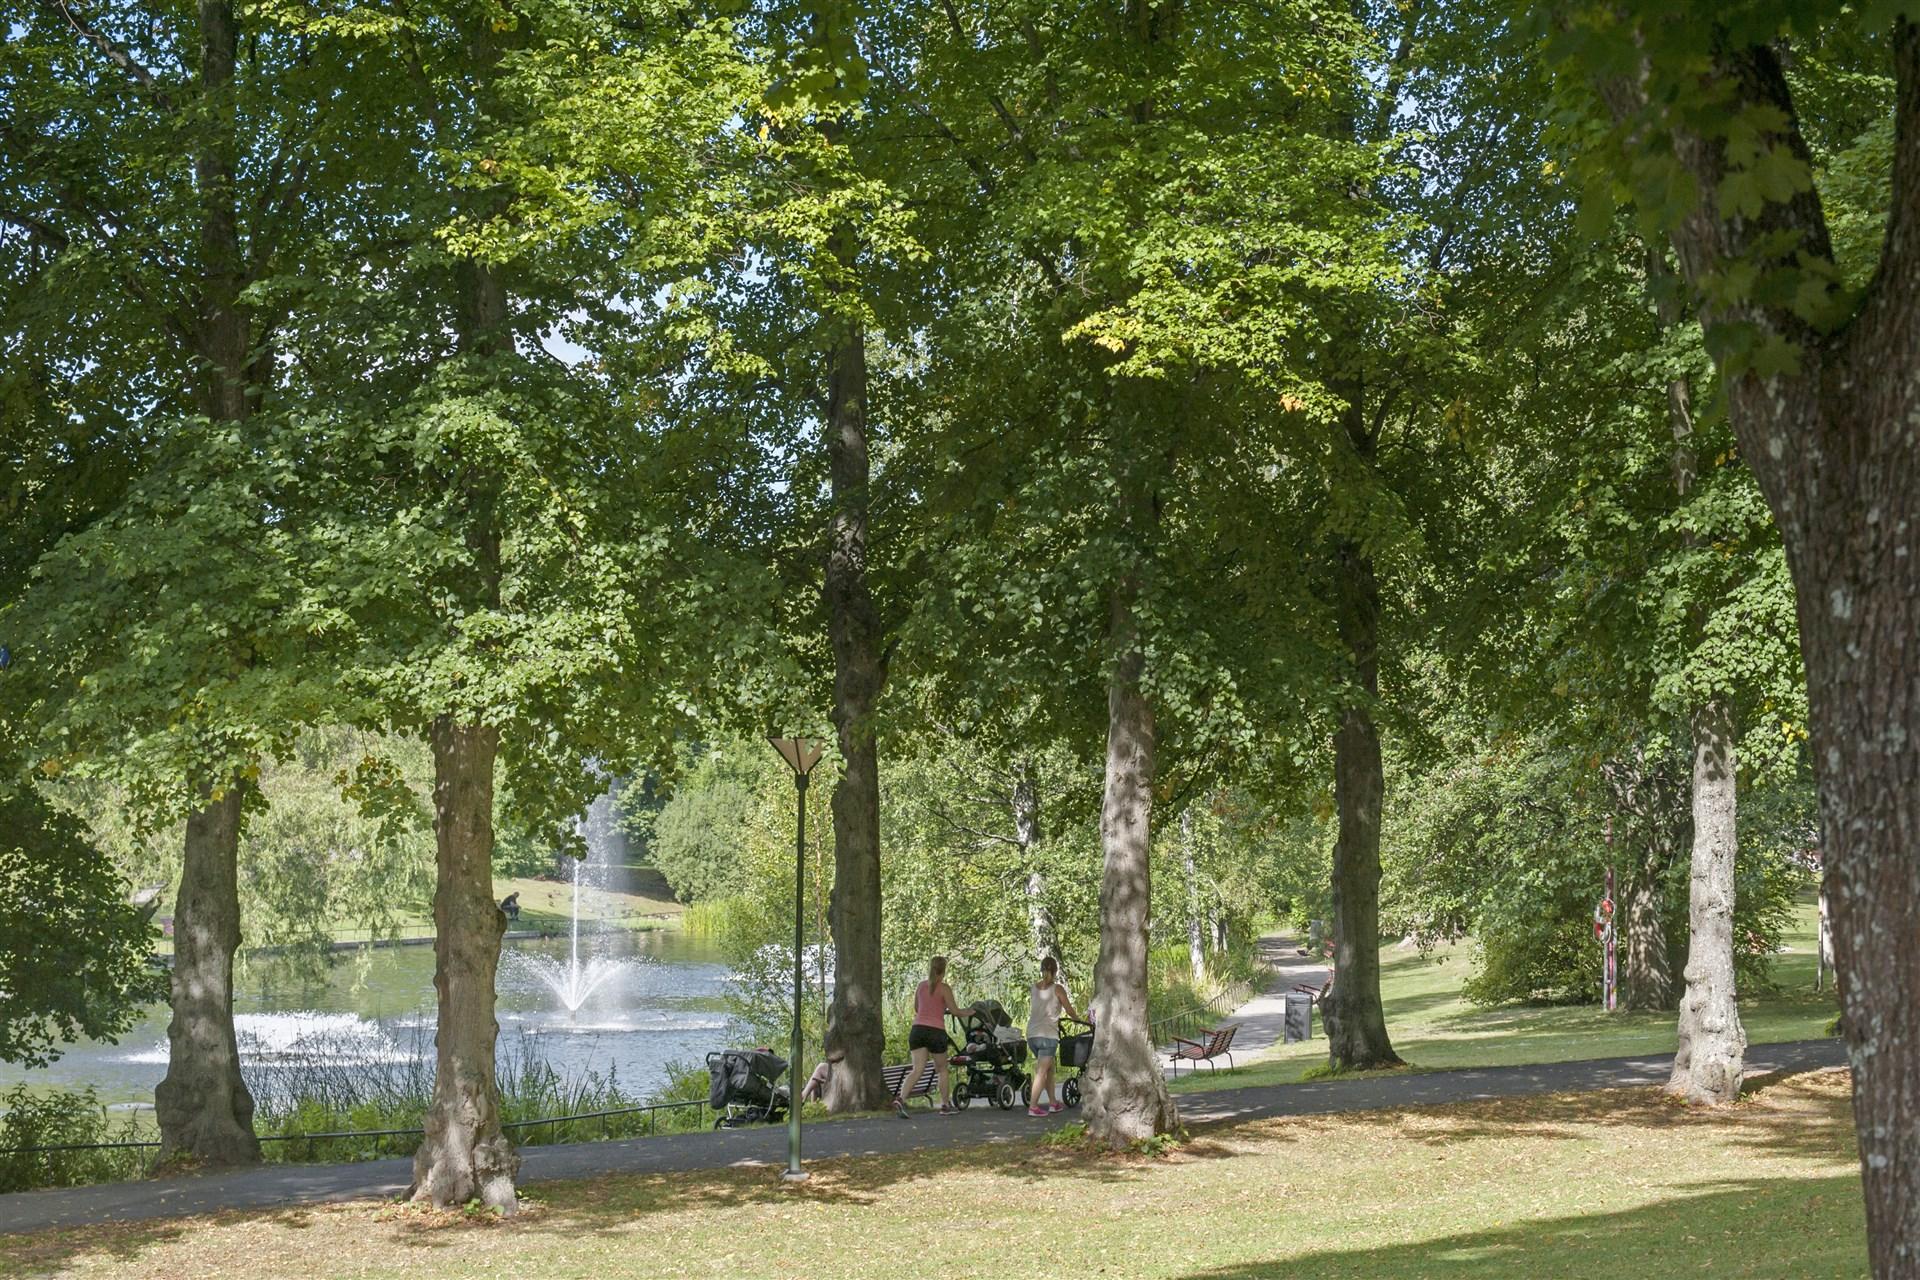 Trevliga promenadstråk i parken